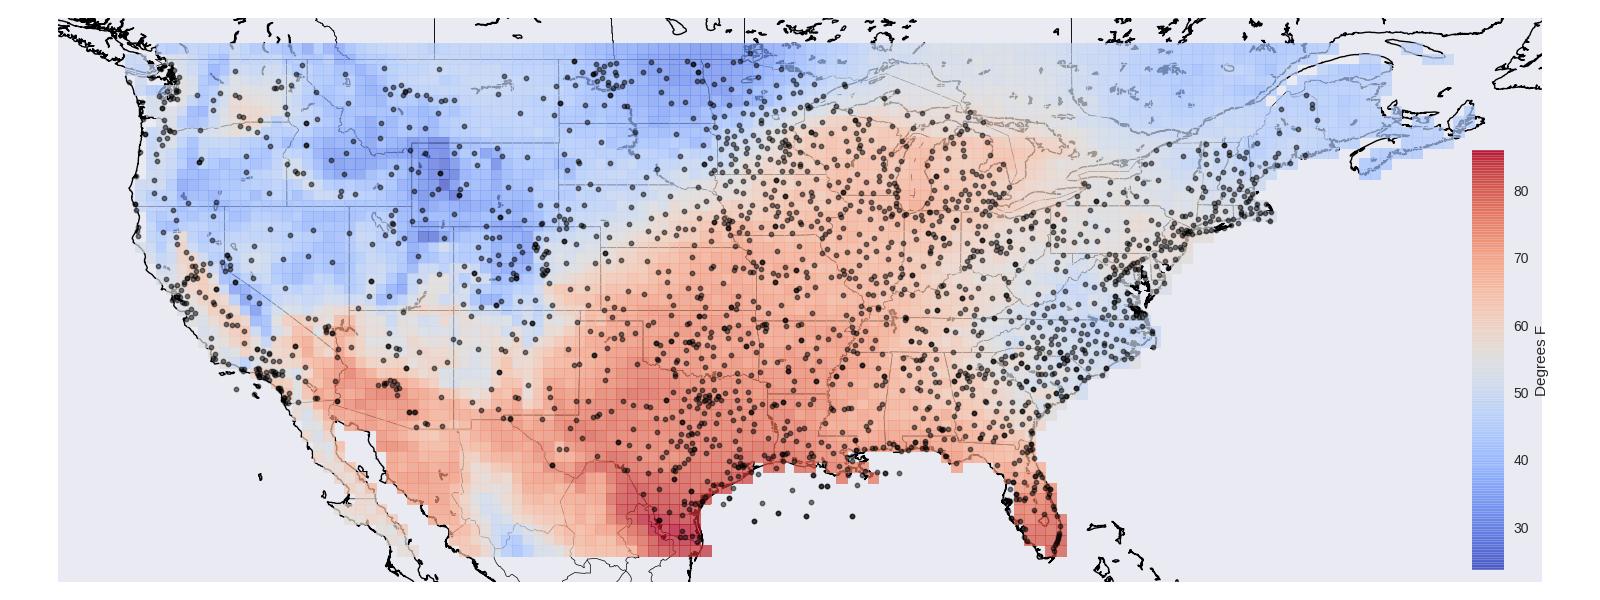 https://raw.githubusercontent.com/swift-nav/albatross/master/examples/temperature_example/mean_temperature.png